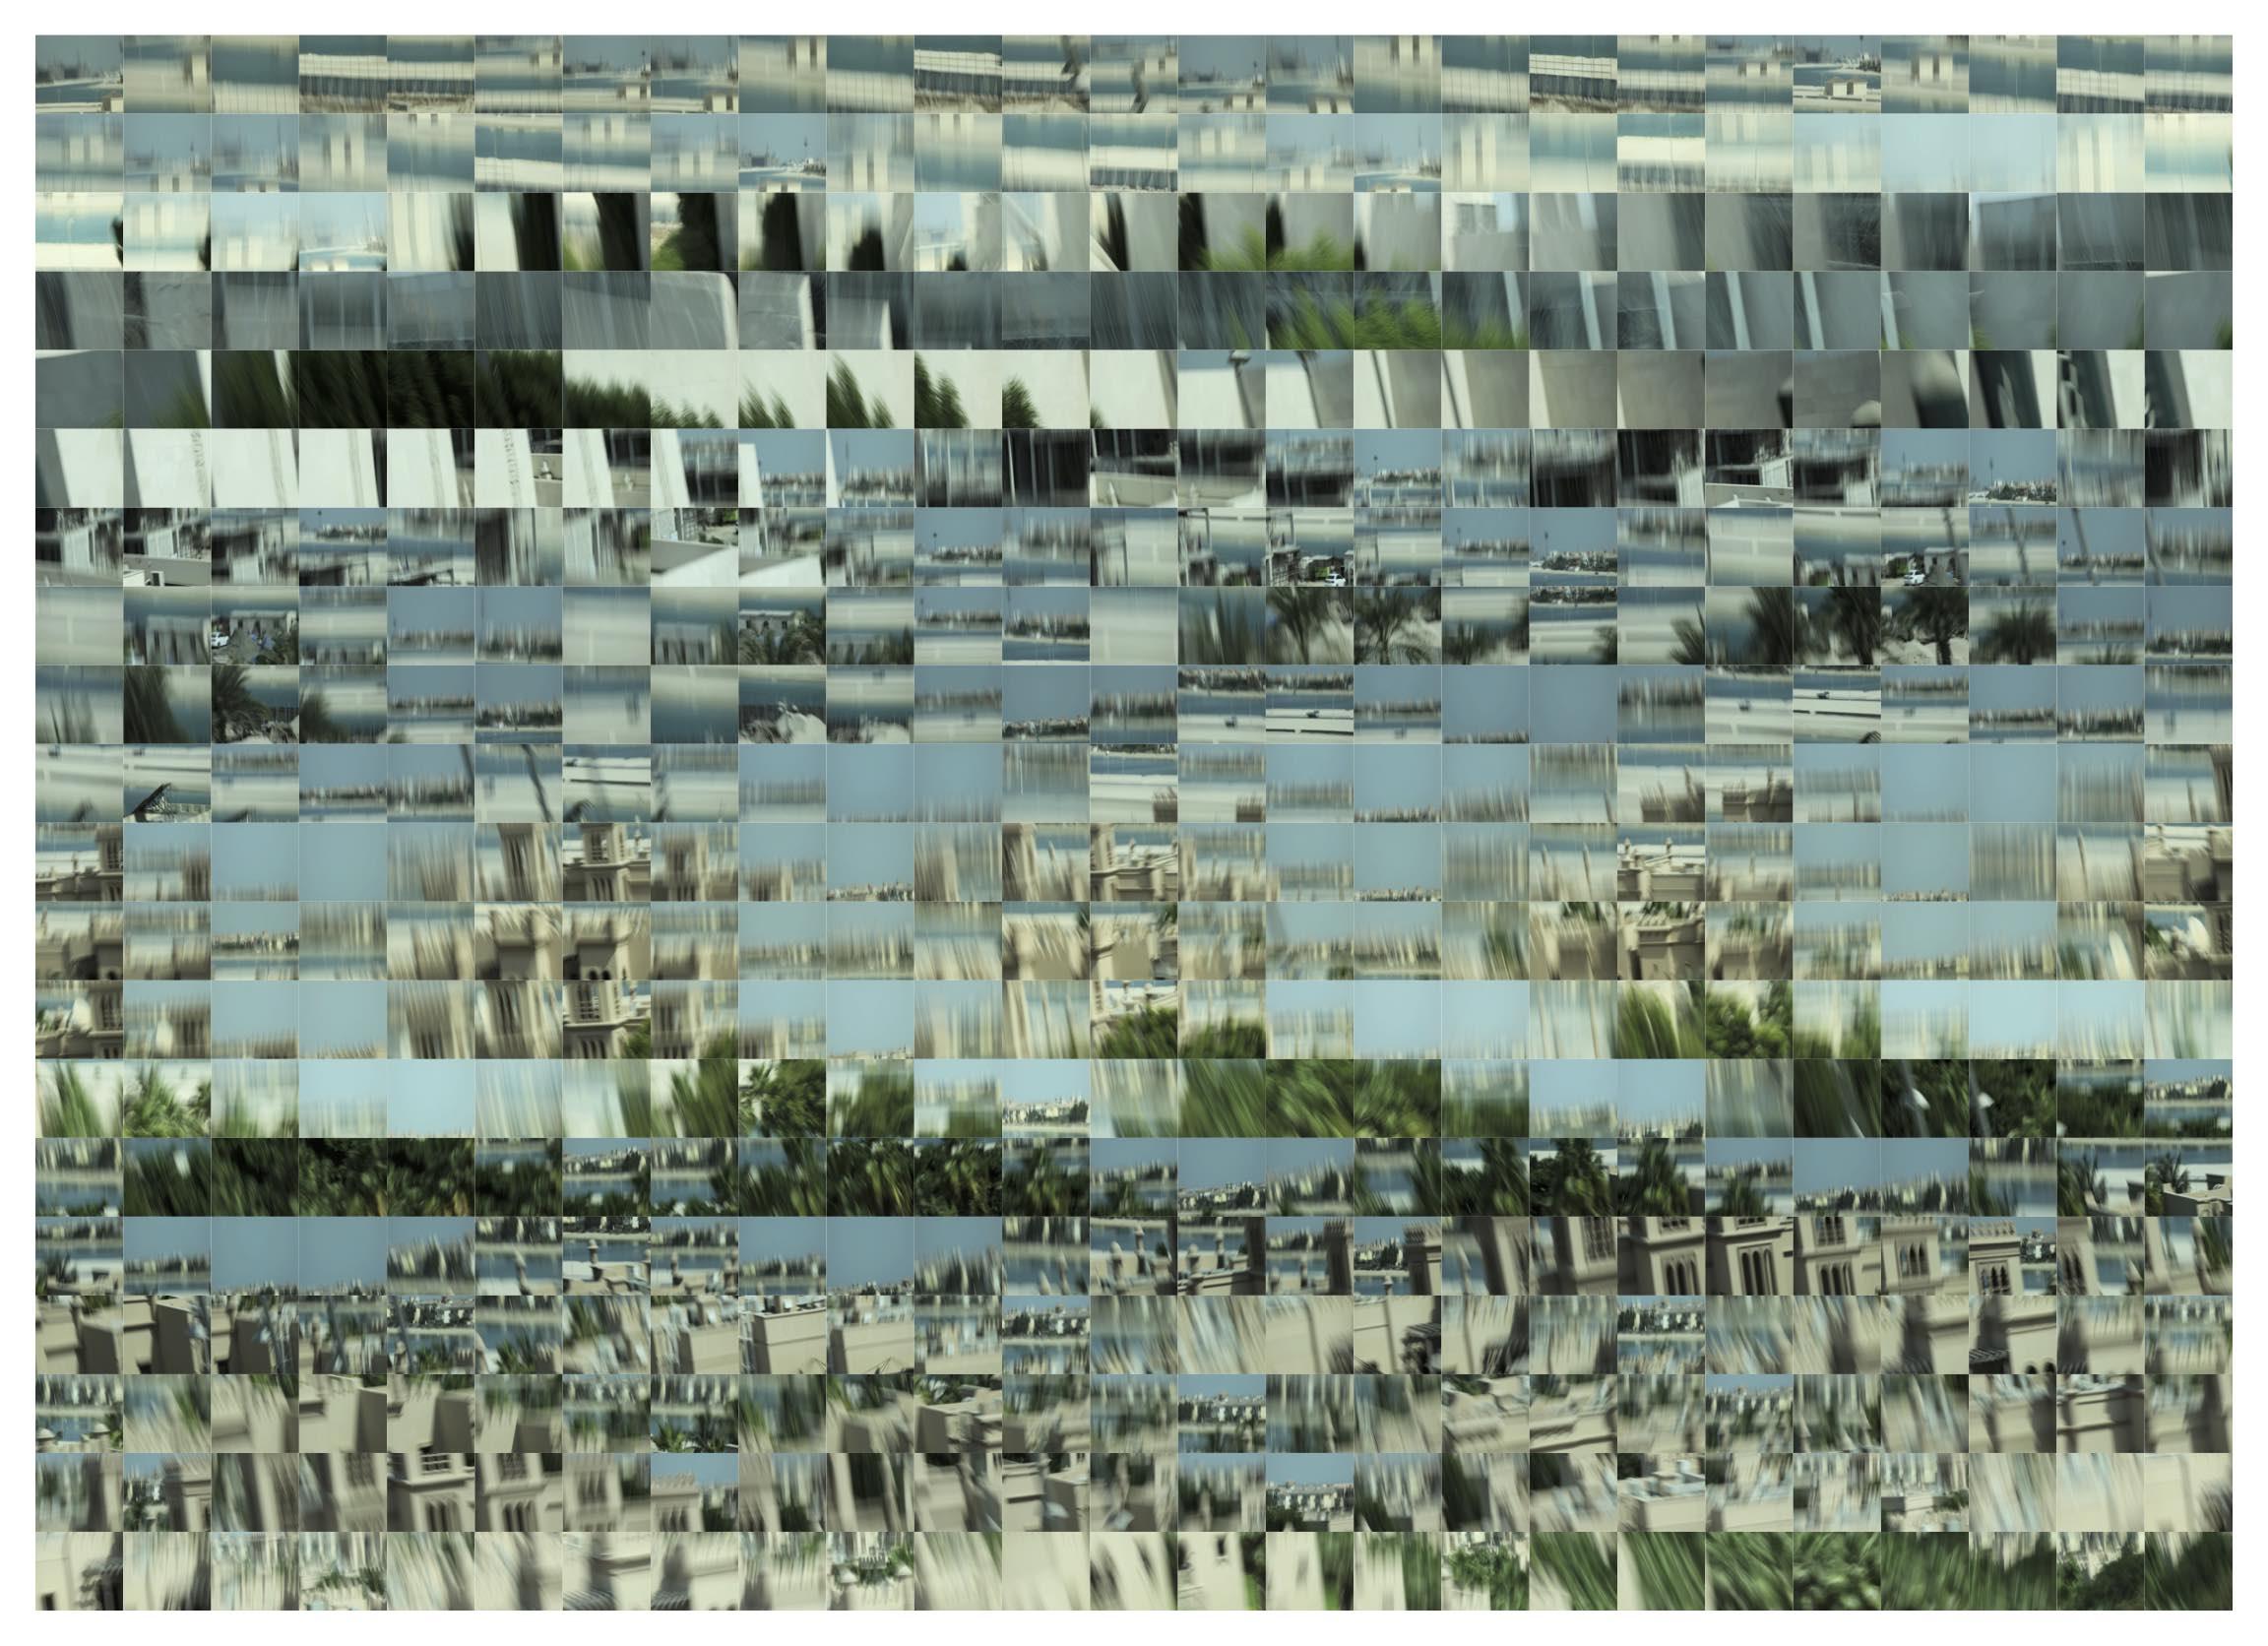 housingdevelopments.jpg